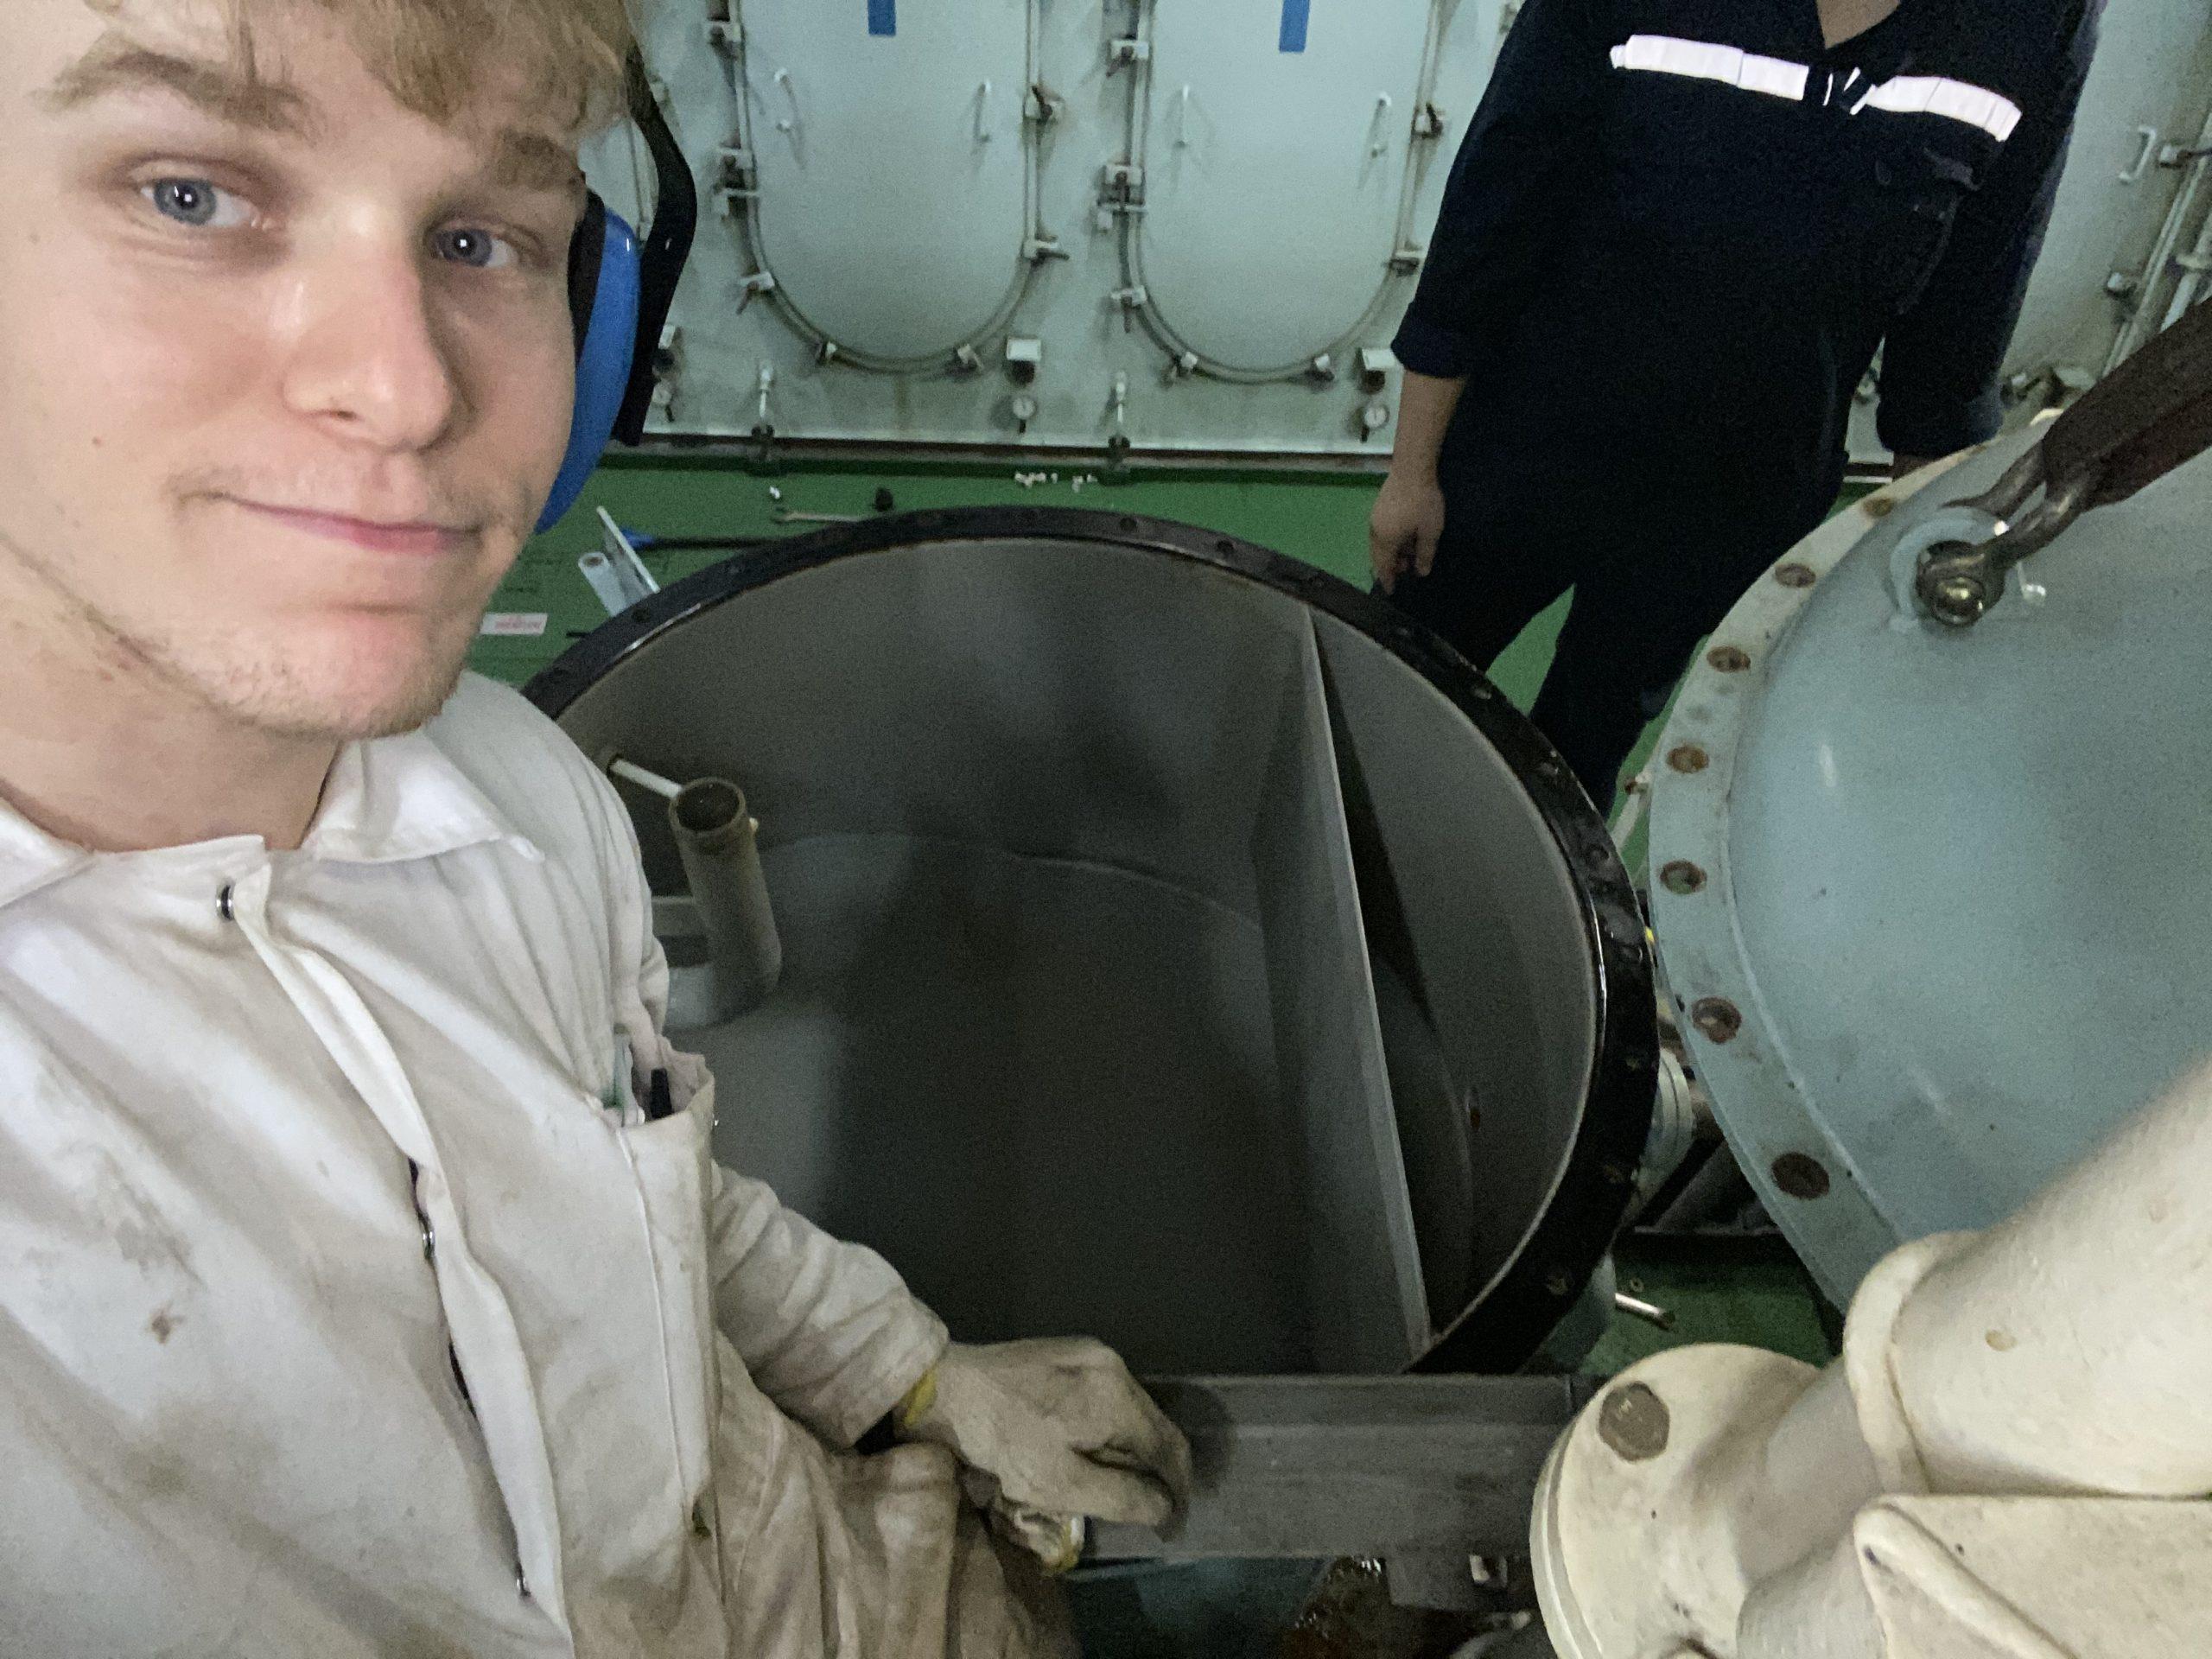 Alex tamas - engineering cadet 1